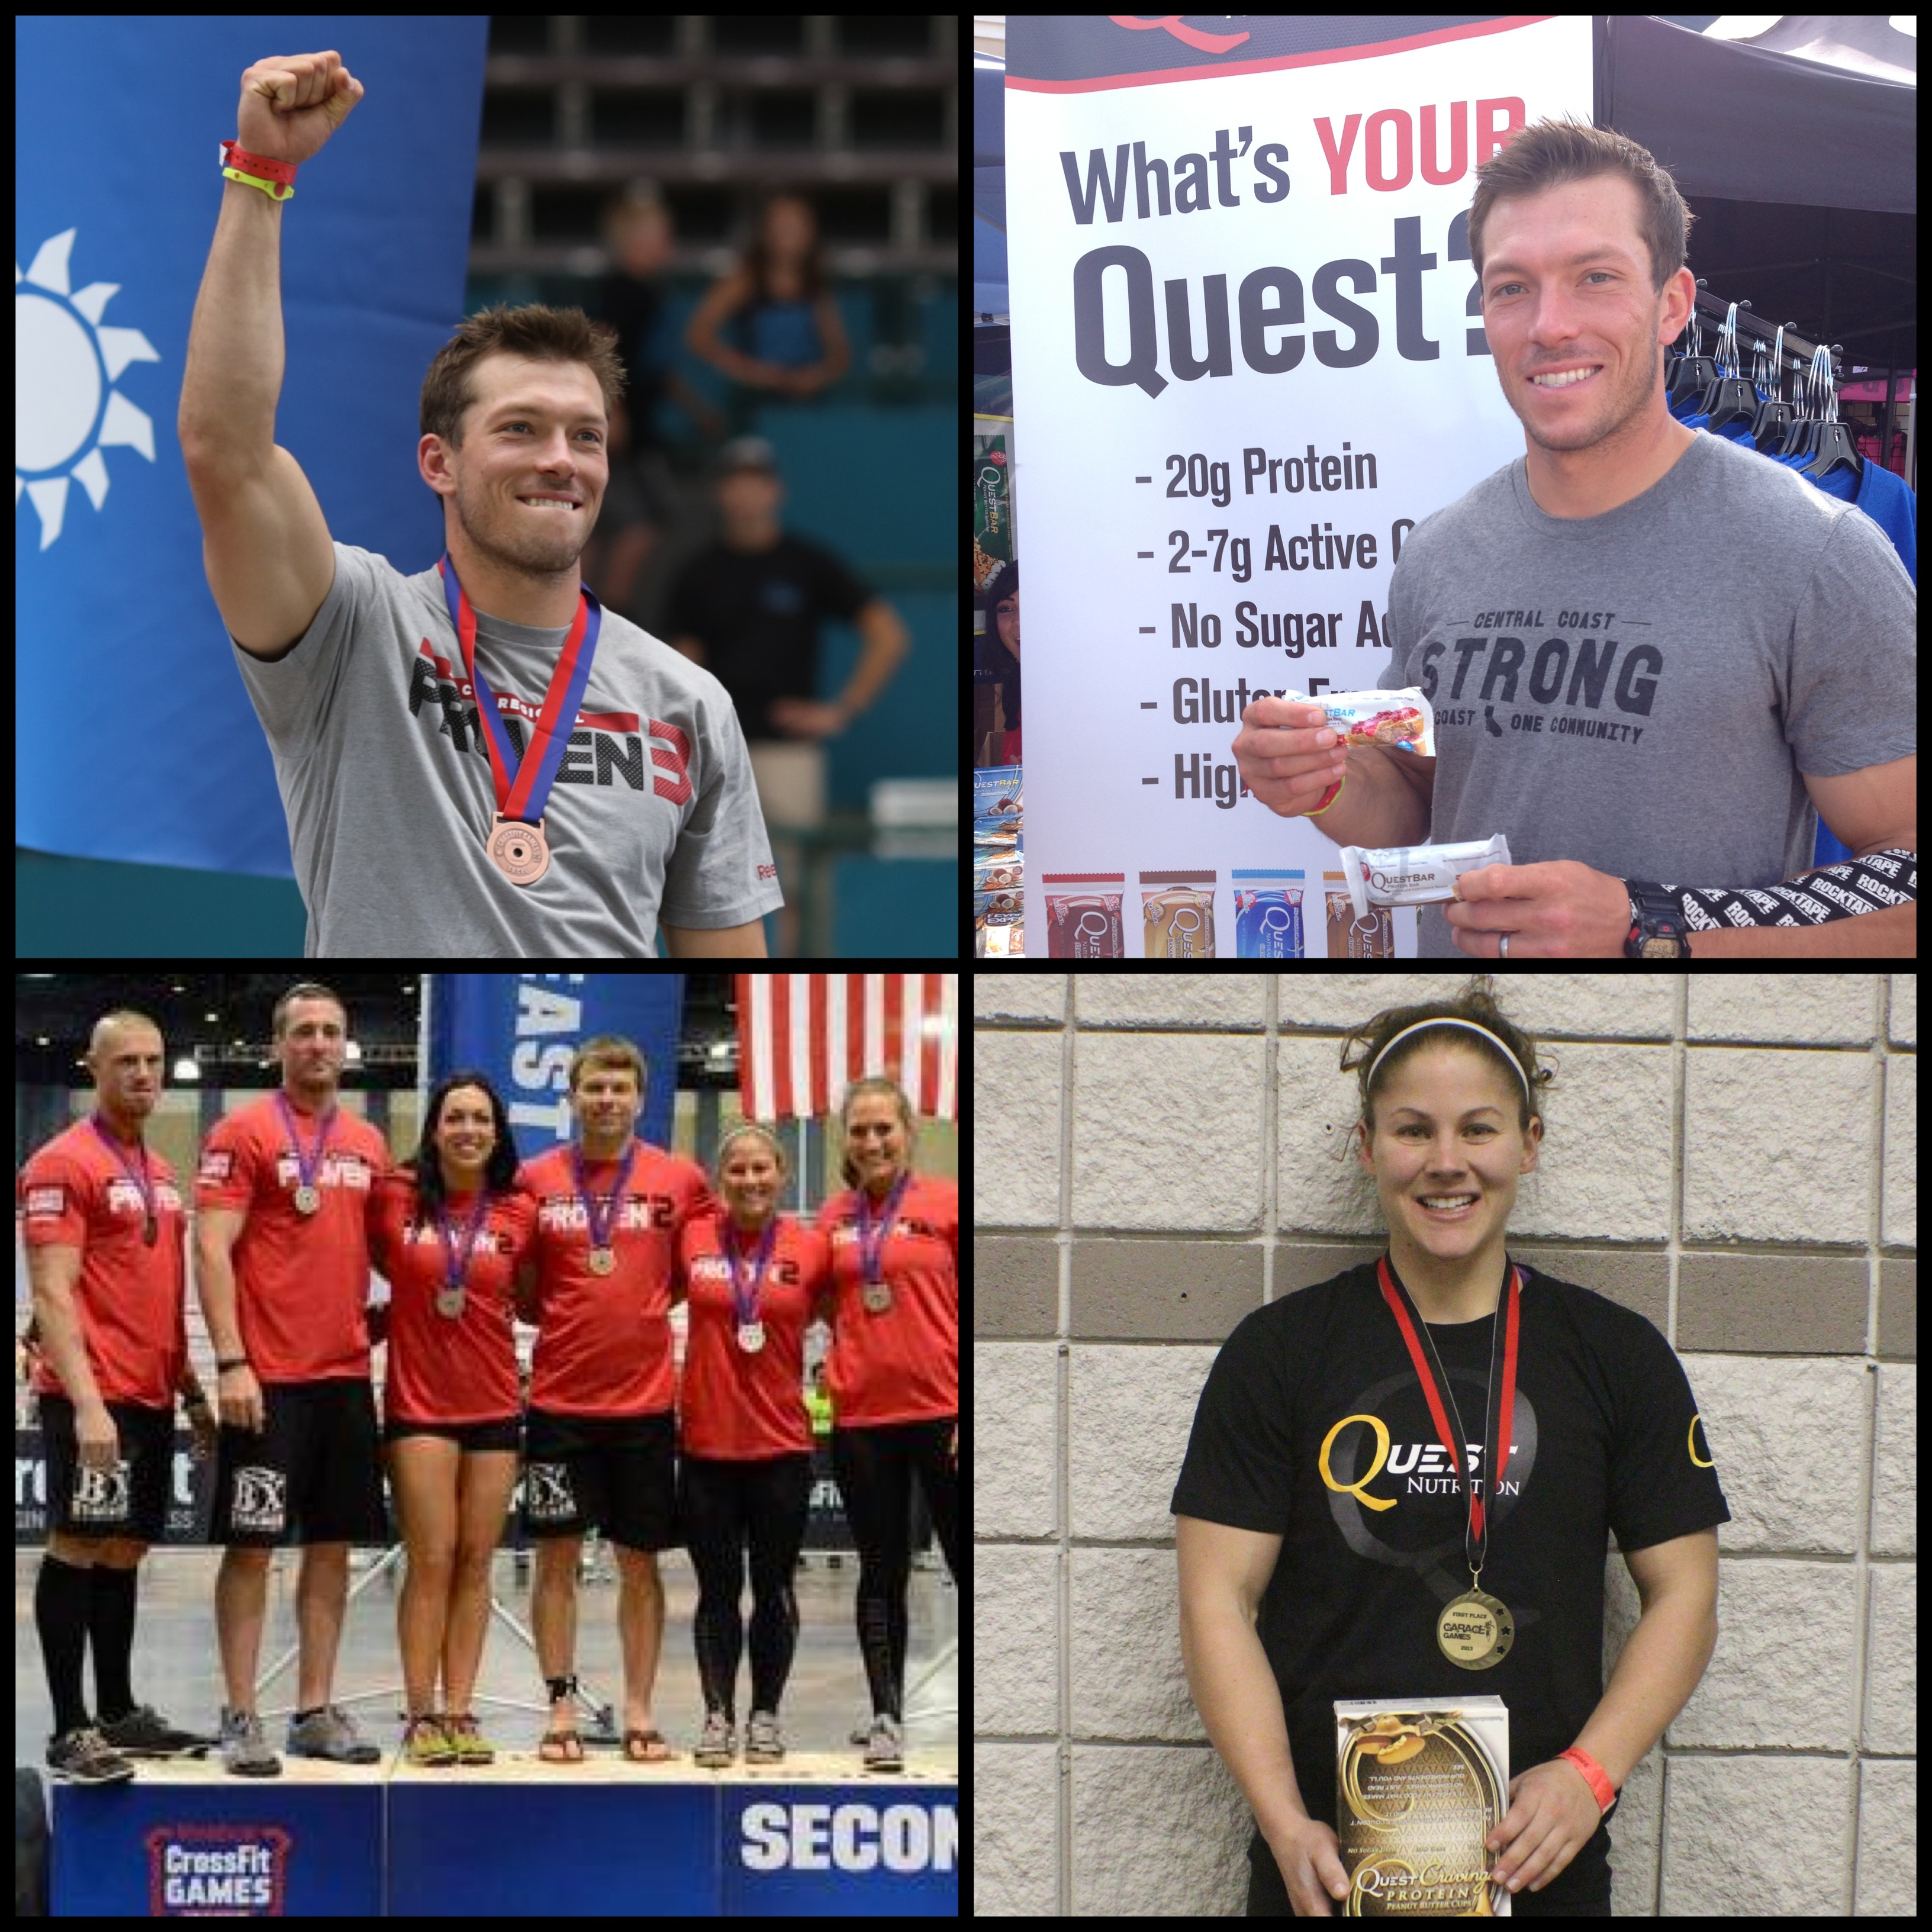 Congratulations to Wes Piatt and CrossFit Adrenaline